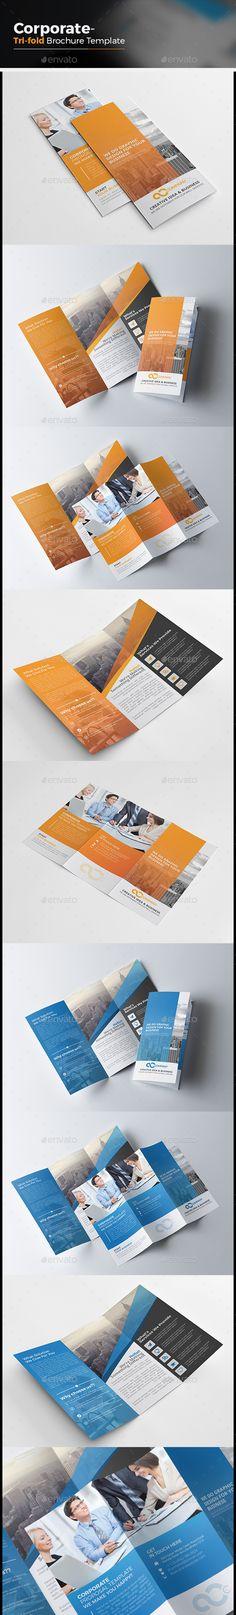 Corporate Tri-fold Brochure Template Vector EPS, AI #design Download: http://graphicriver.net/item/corporate-trifold-brochure/14033340?ref=ksioks